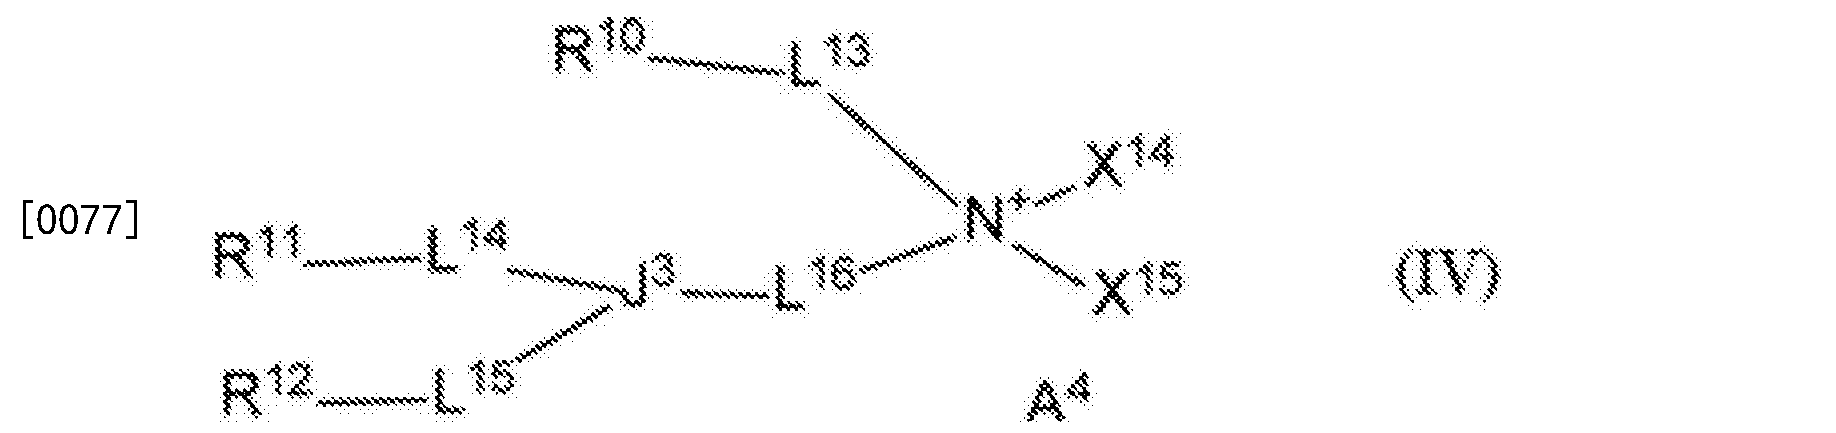 Figure CN107427531AD00461